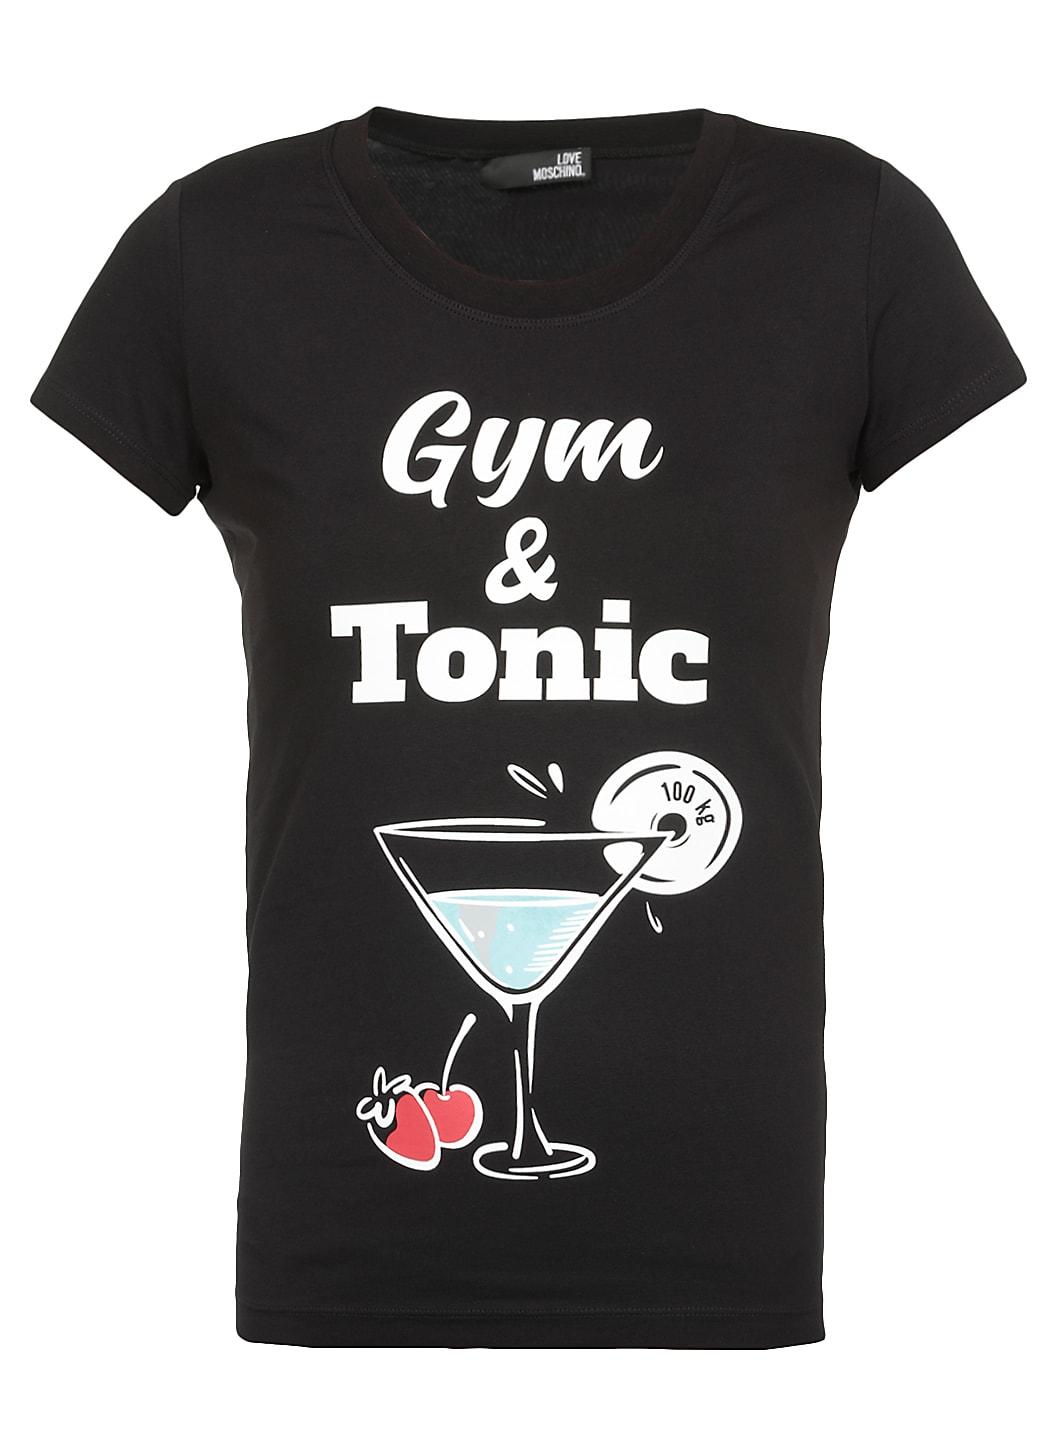 Love Moschino Gym Tonic T-shirt